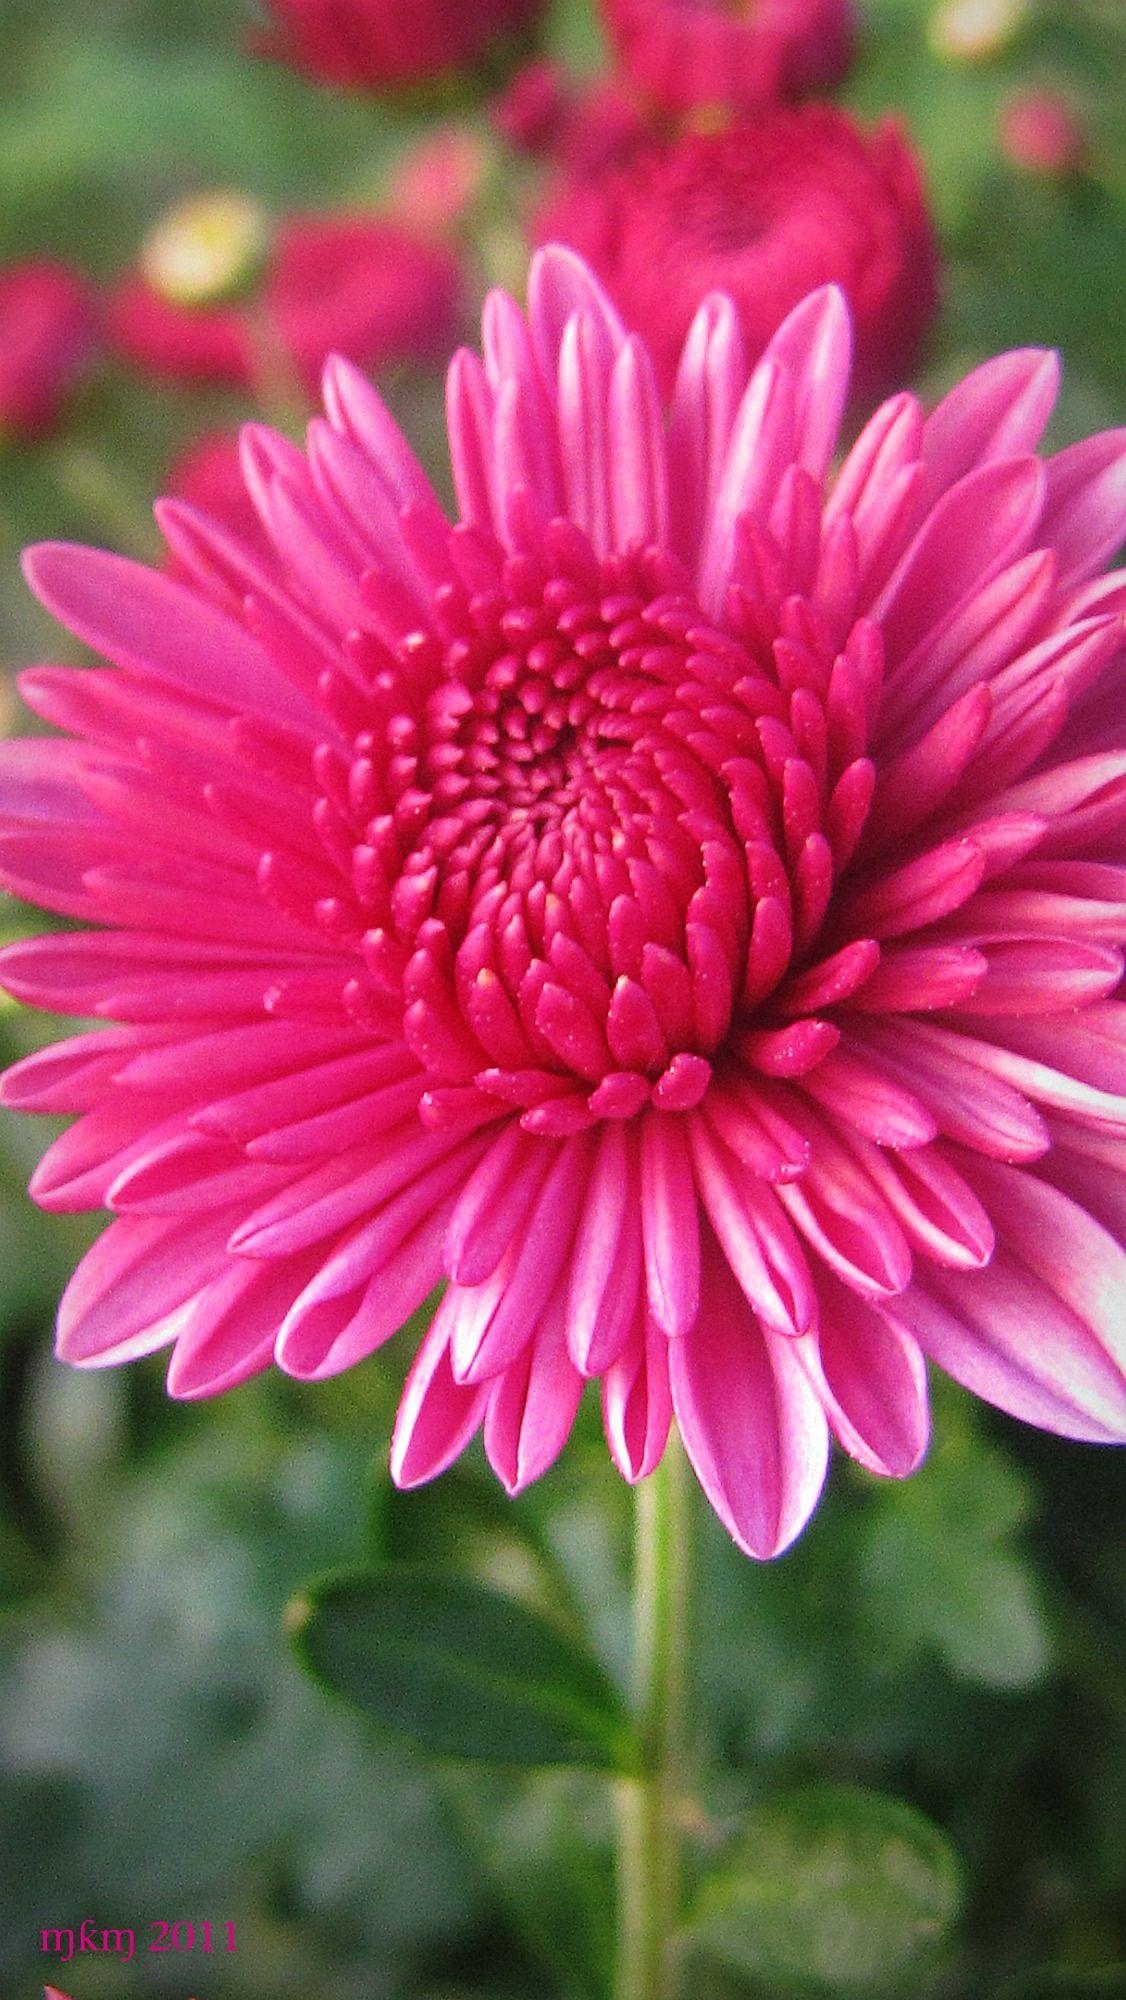 Chrysanthemum Chyrsanthemums are another flower that make